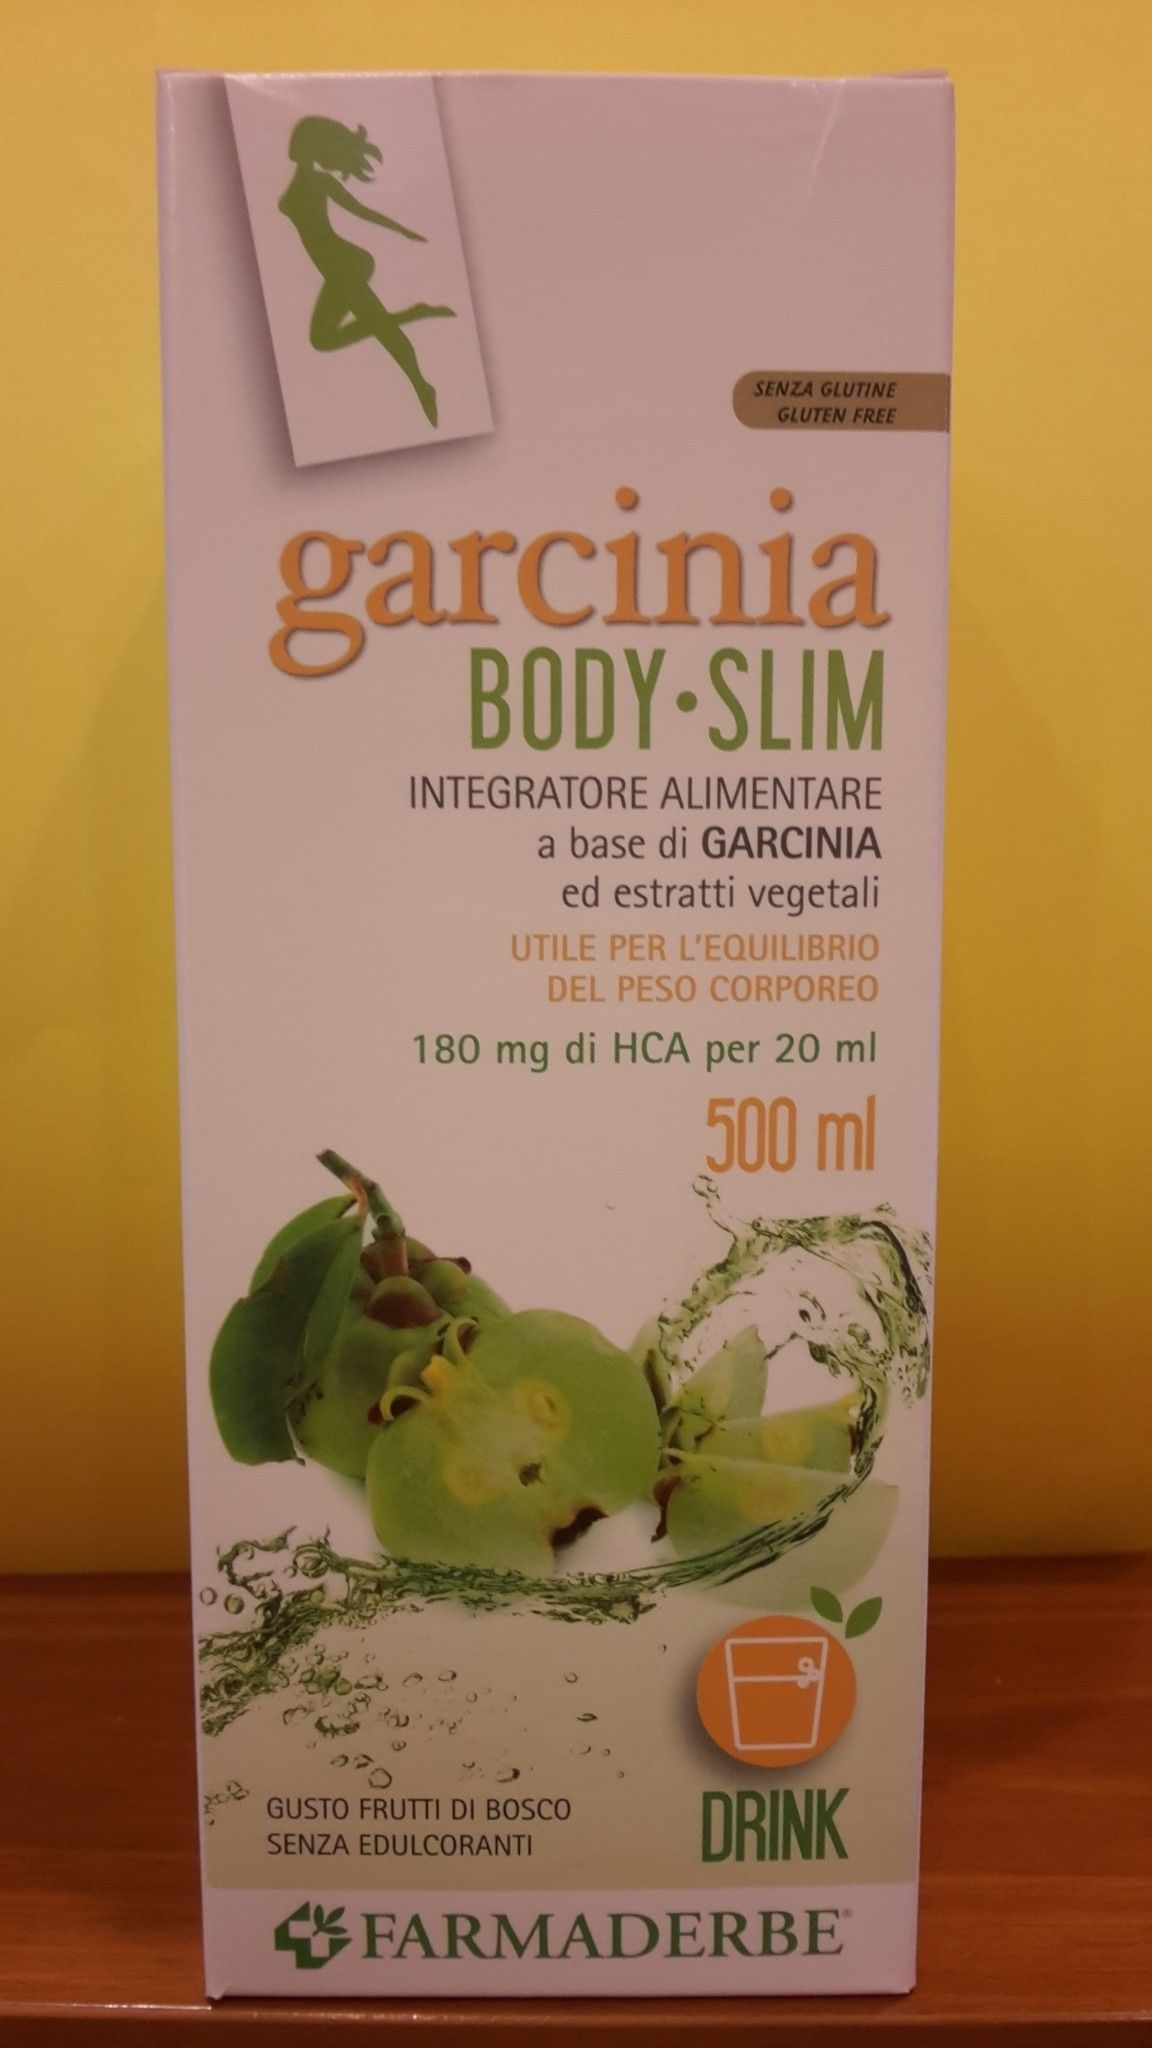 Garcinia BODY- SLIM - 500 ml - FARMADERBE